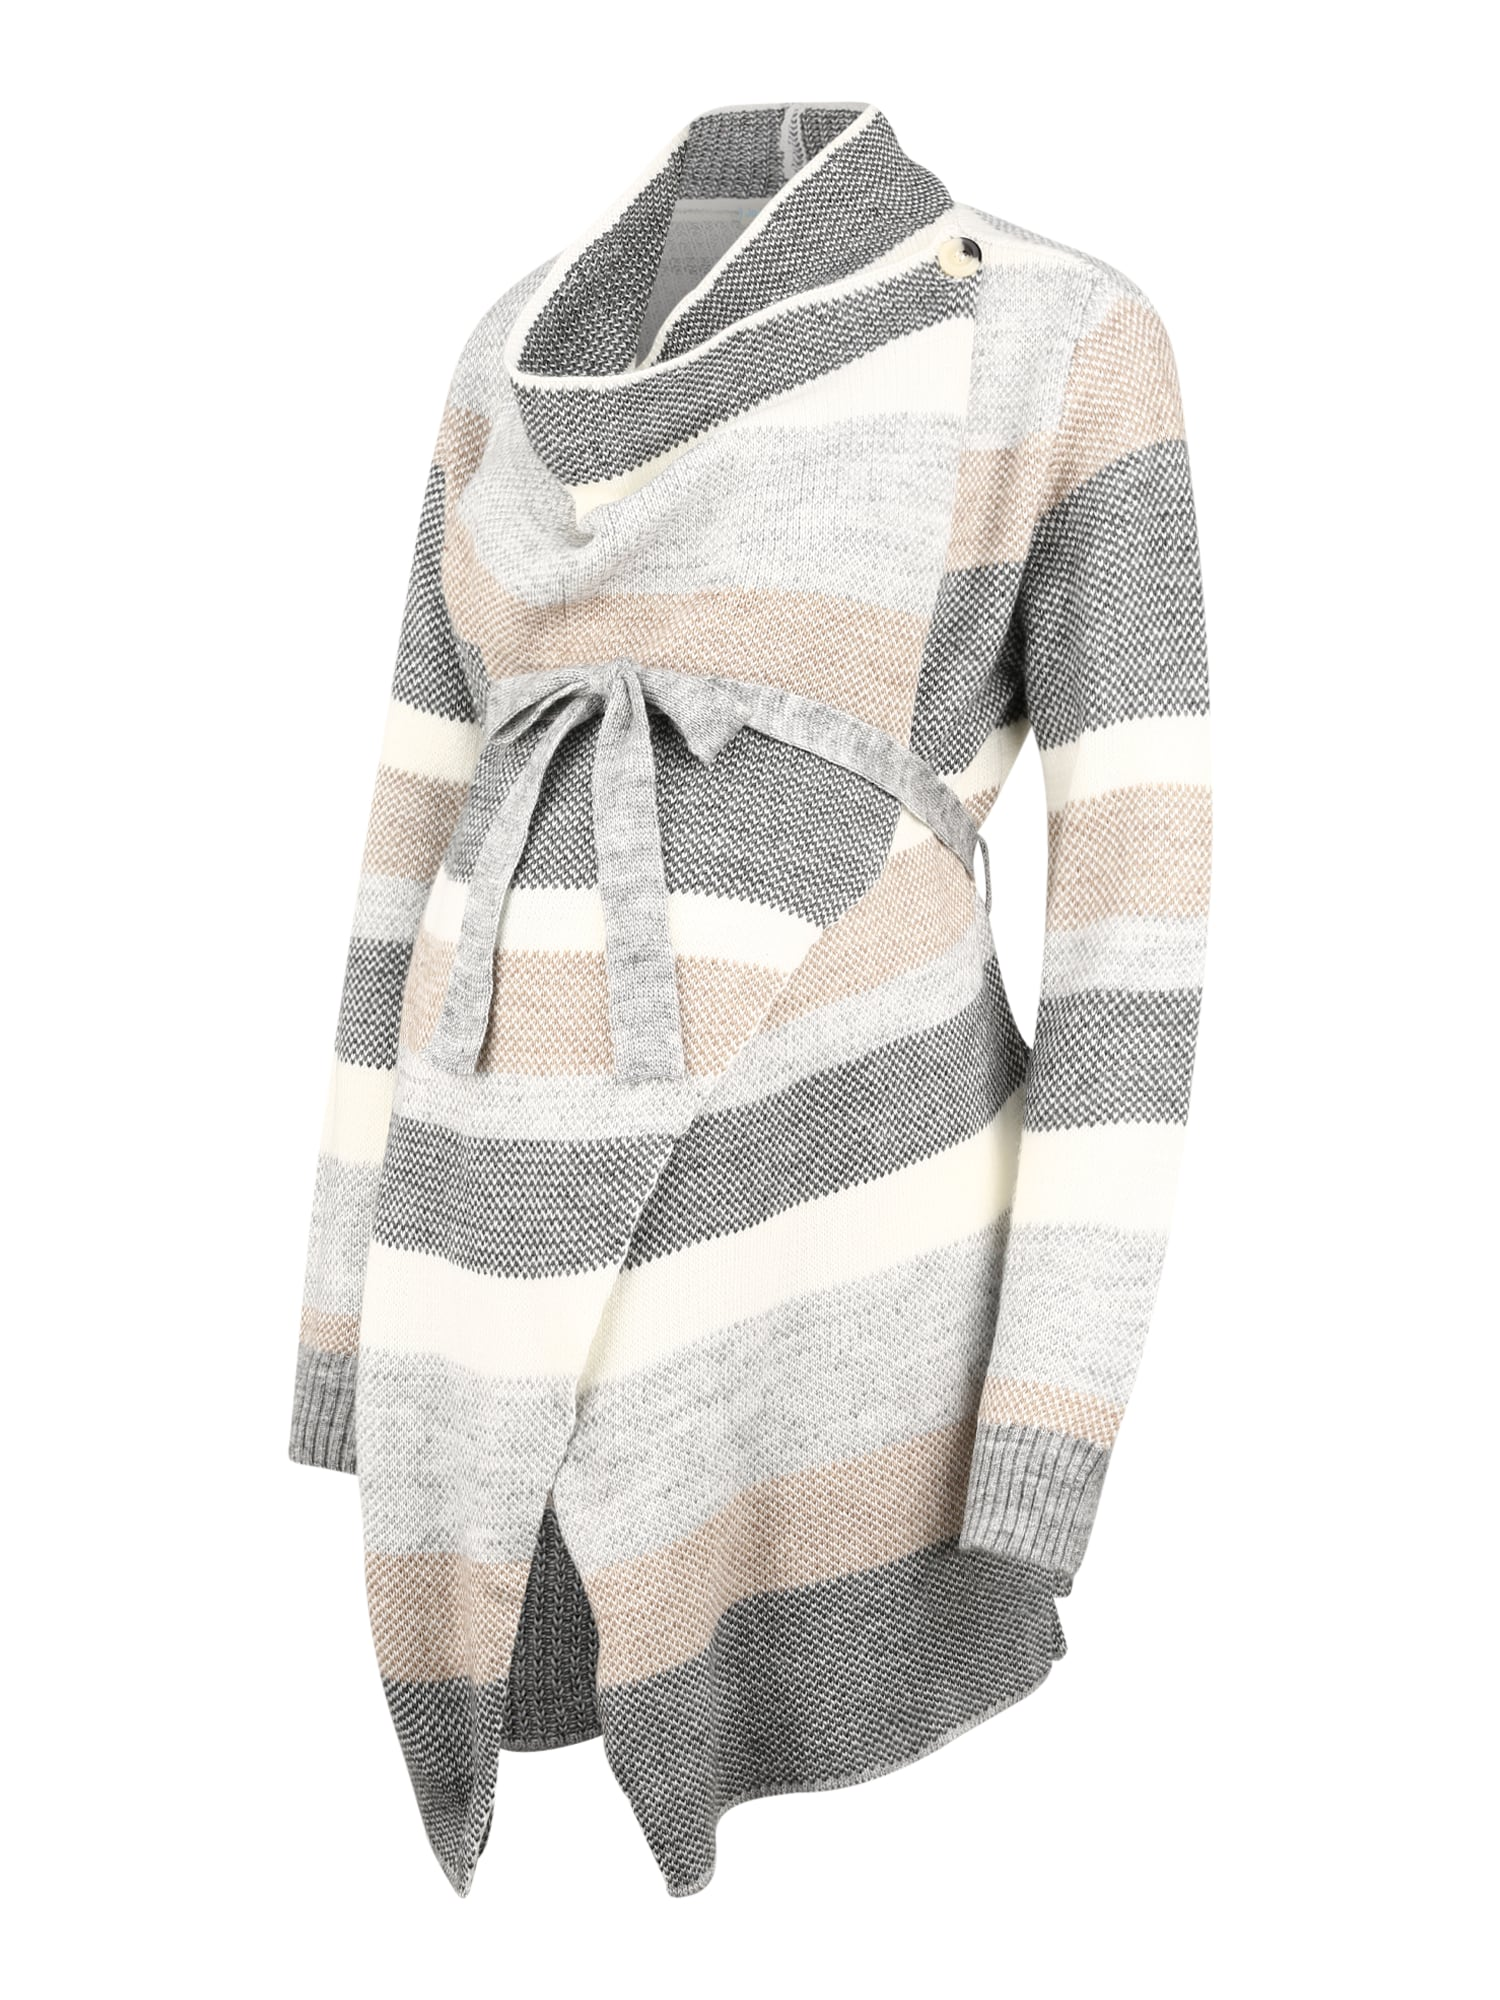 JoJo Maman Bébé Kardiganas smėlio spalva / bazalto pilka / balta / margai pilka